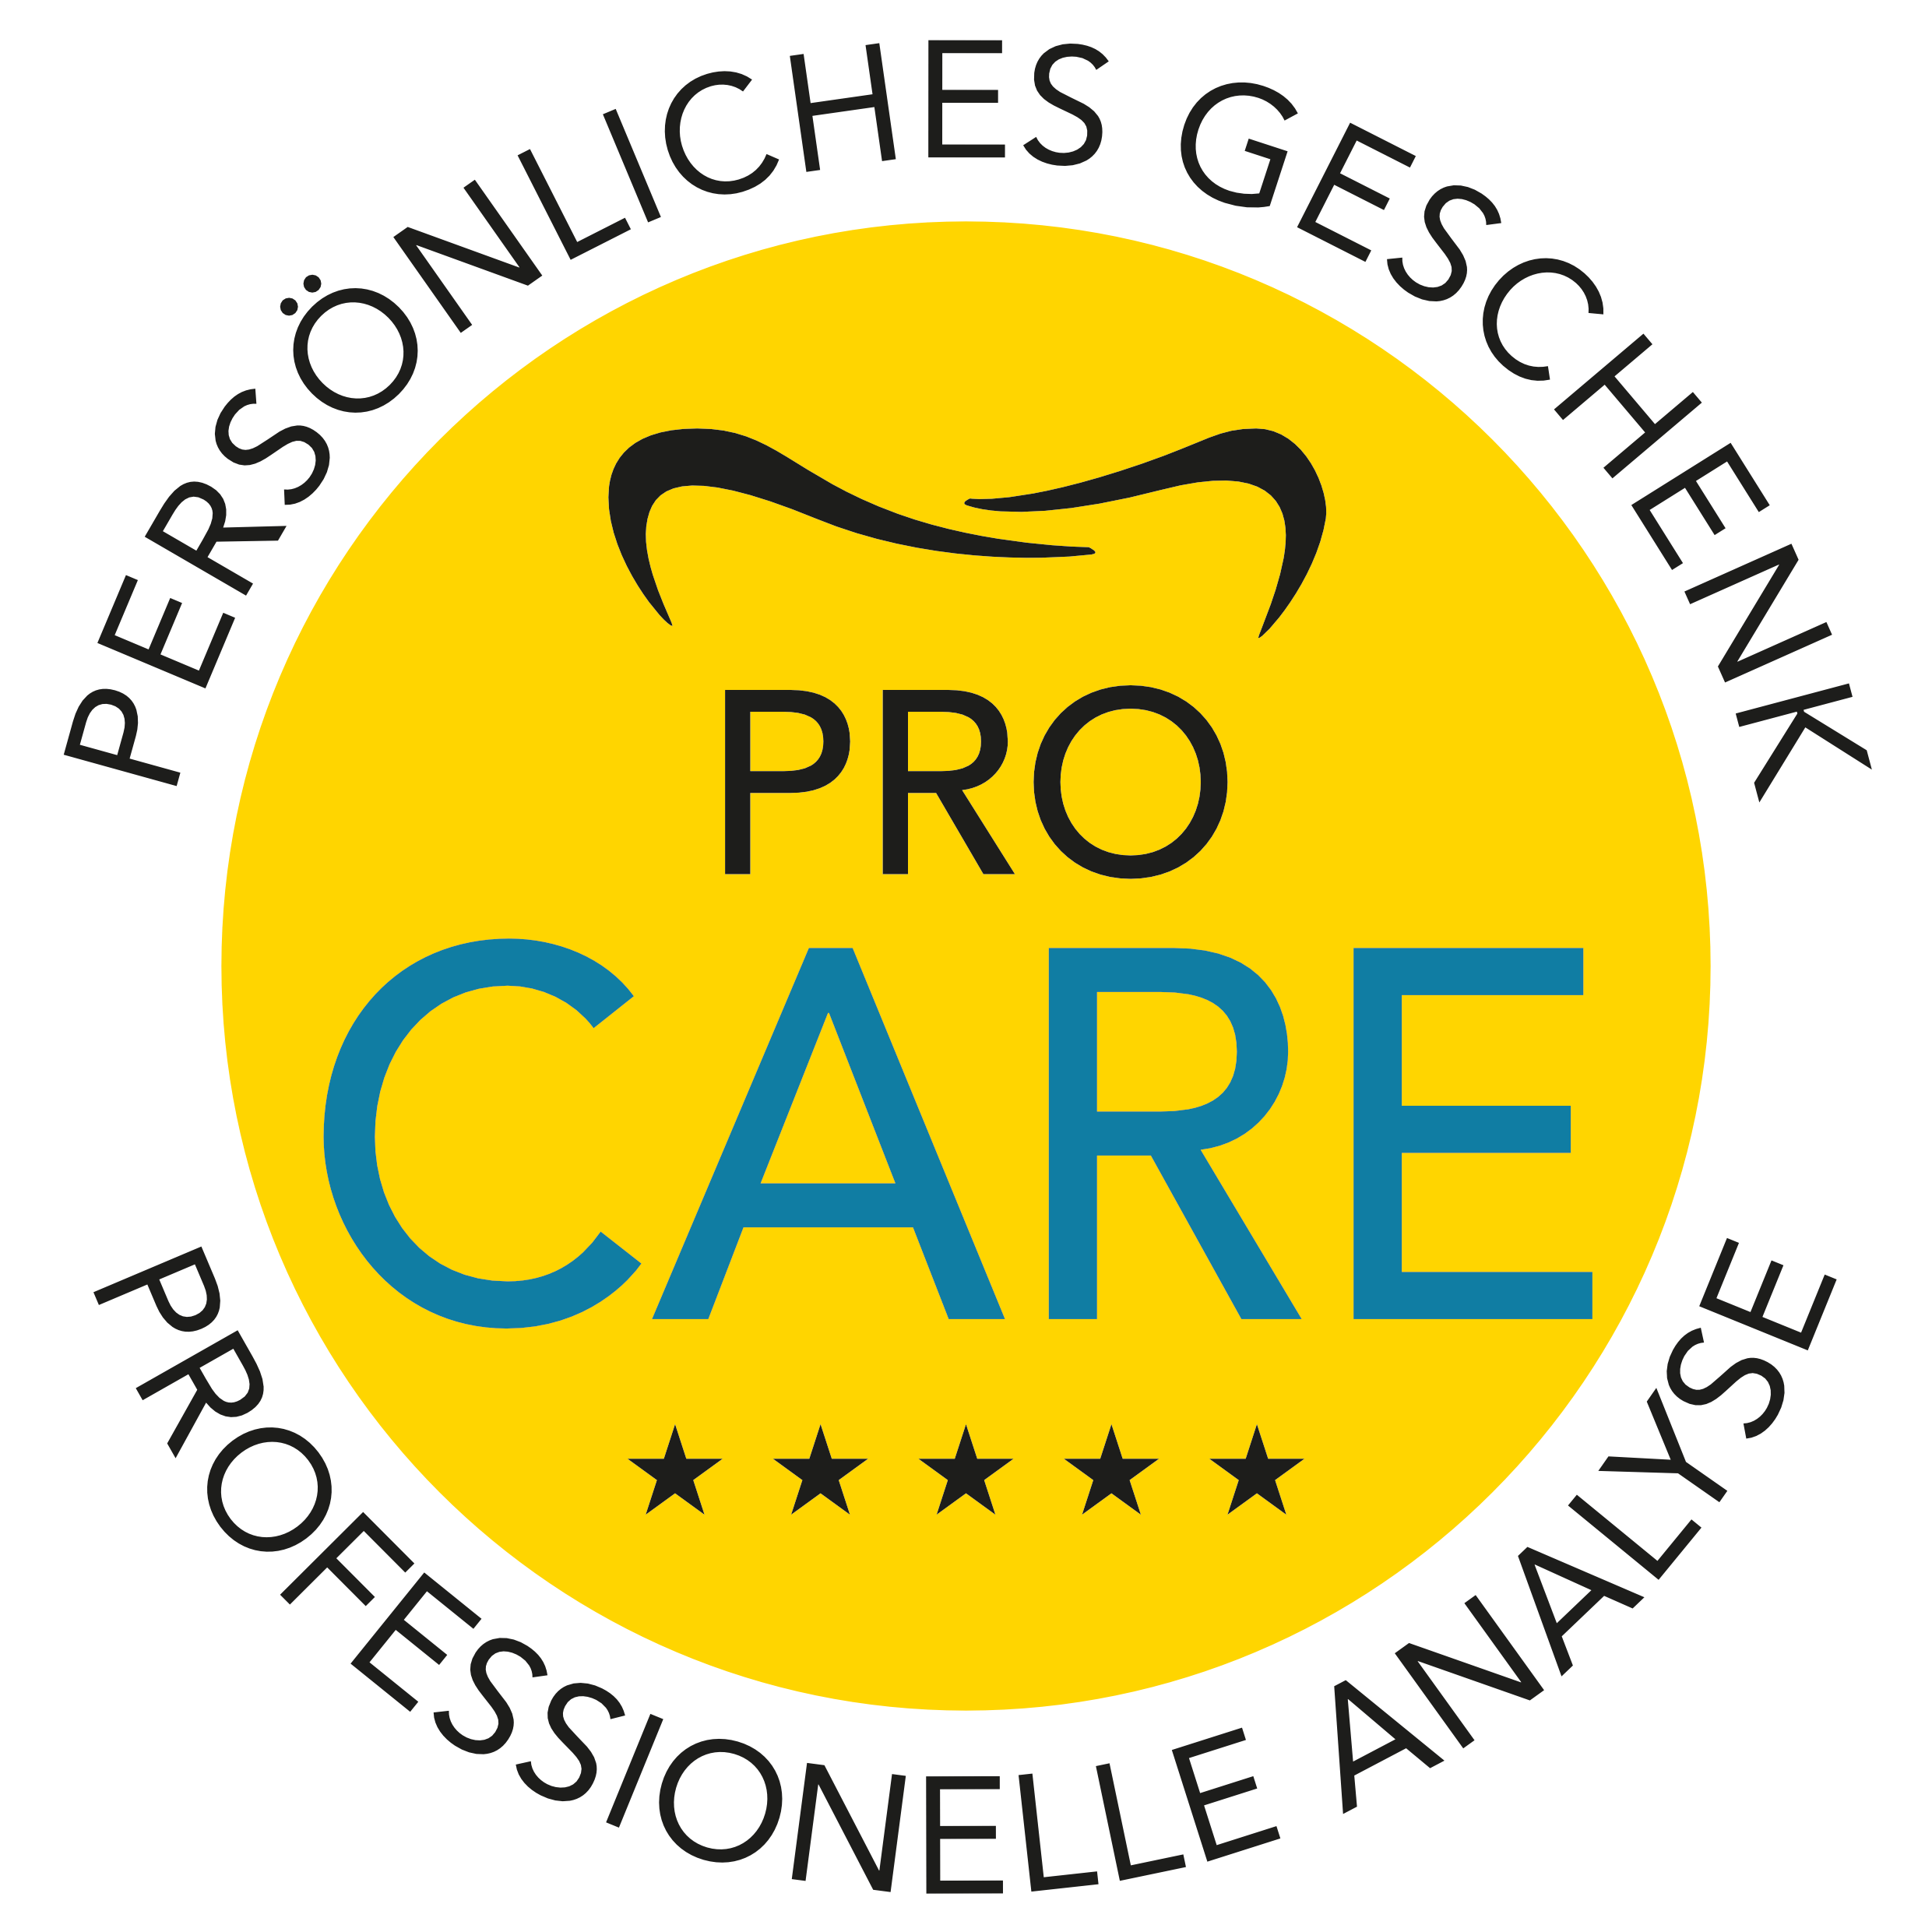 Geschenk - Erstuntersuchung ProCARE beim Zahnarzt